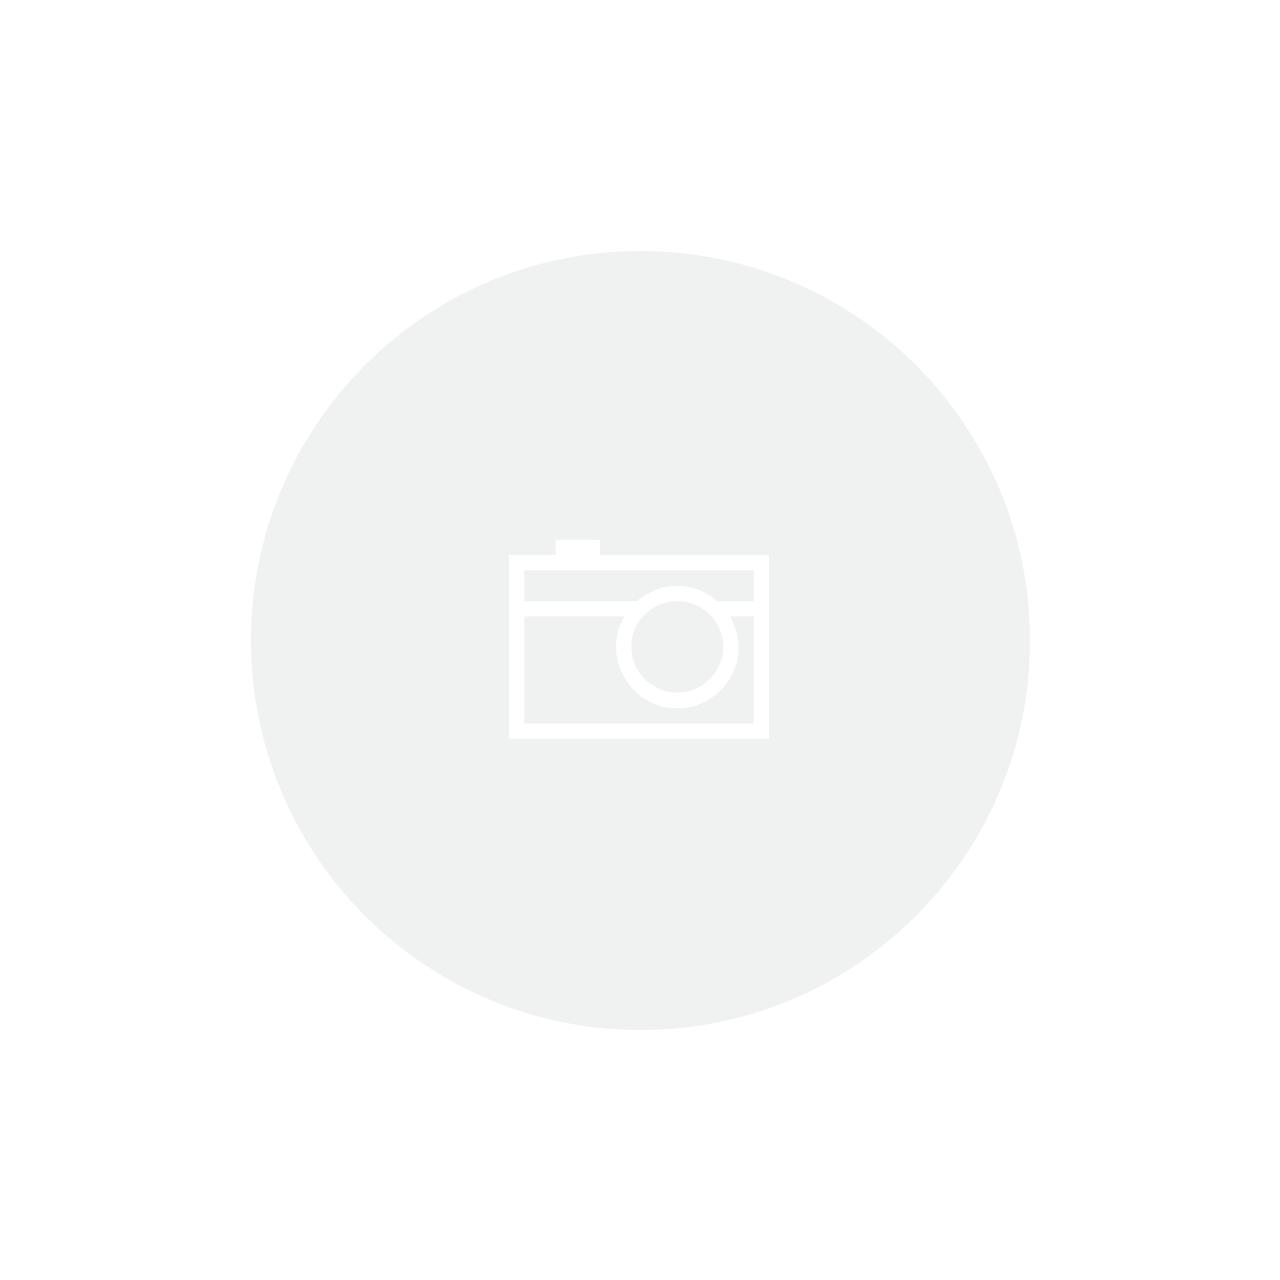 Papel Artesanal Indiano - Ref. 96